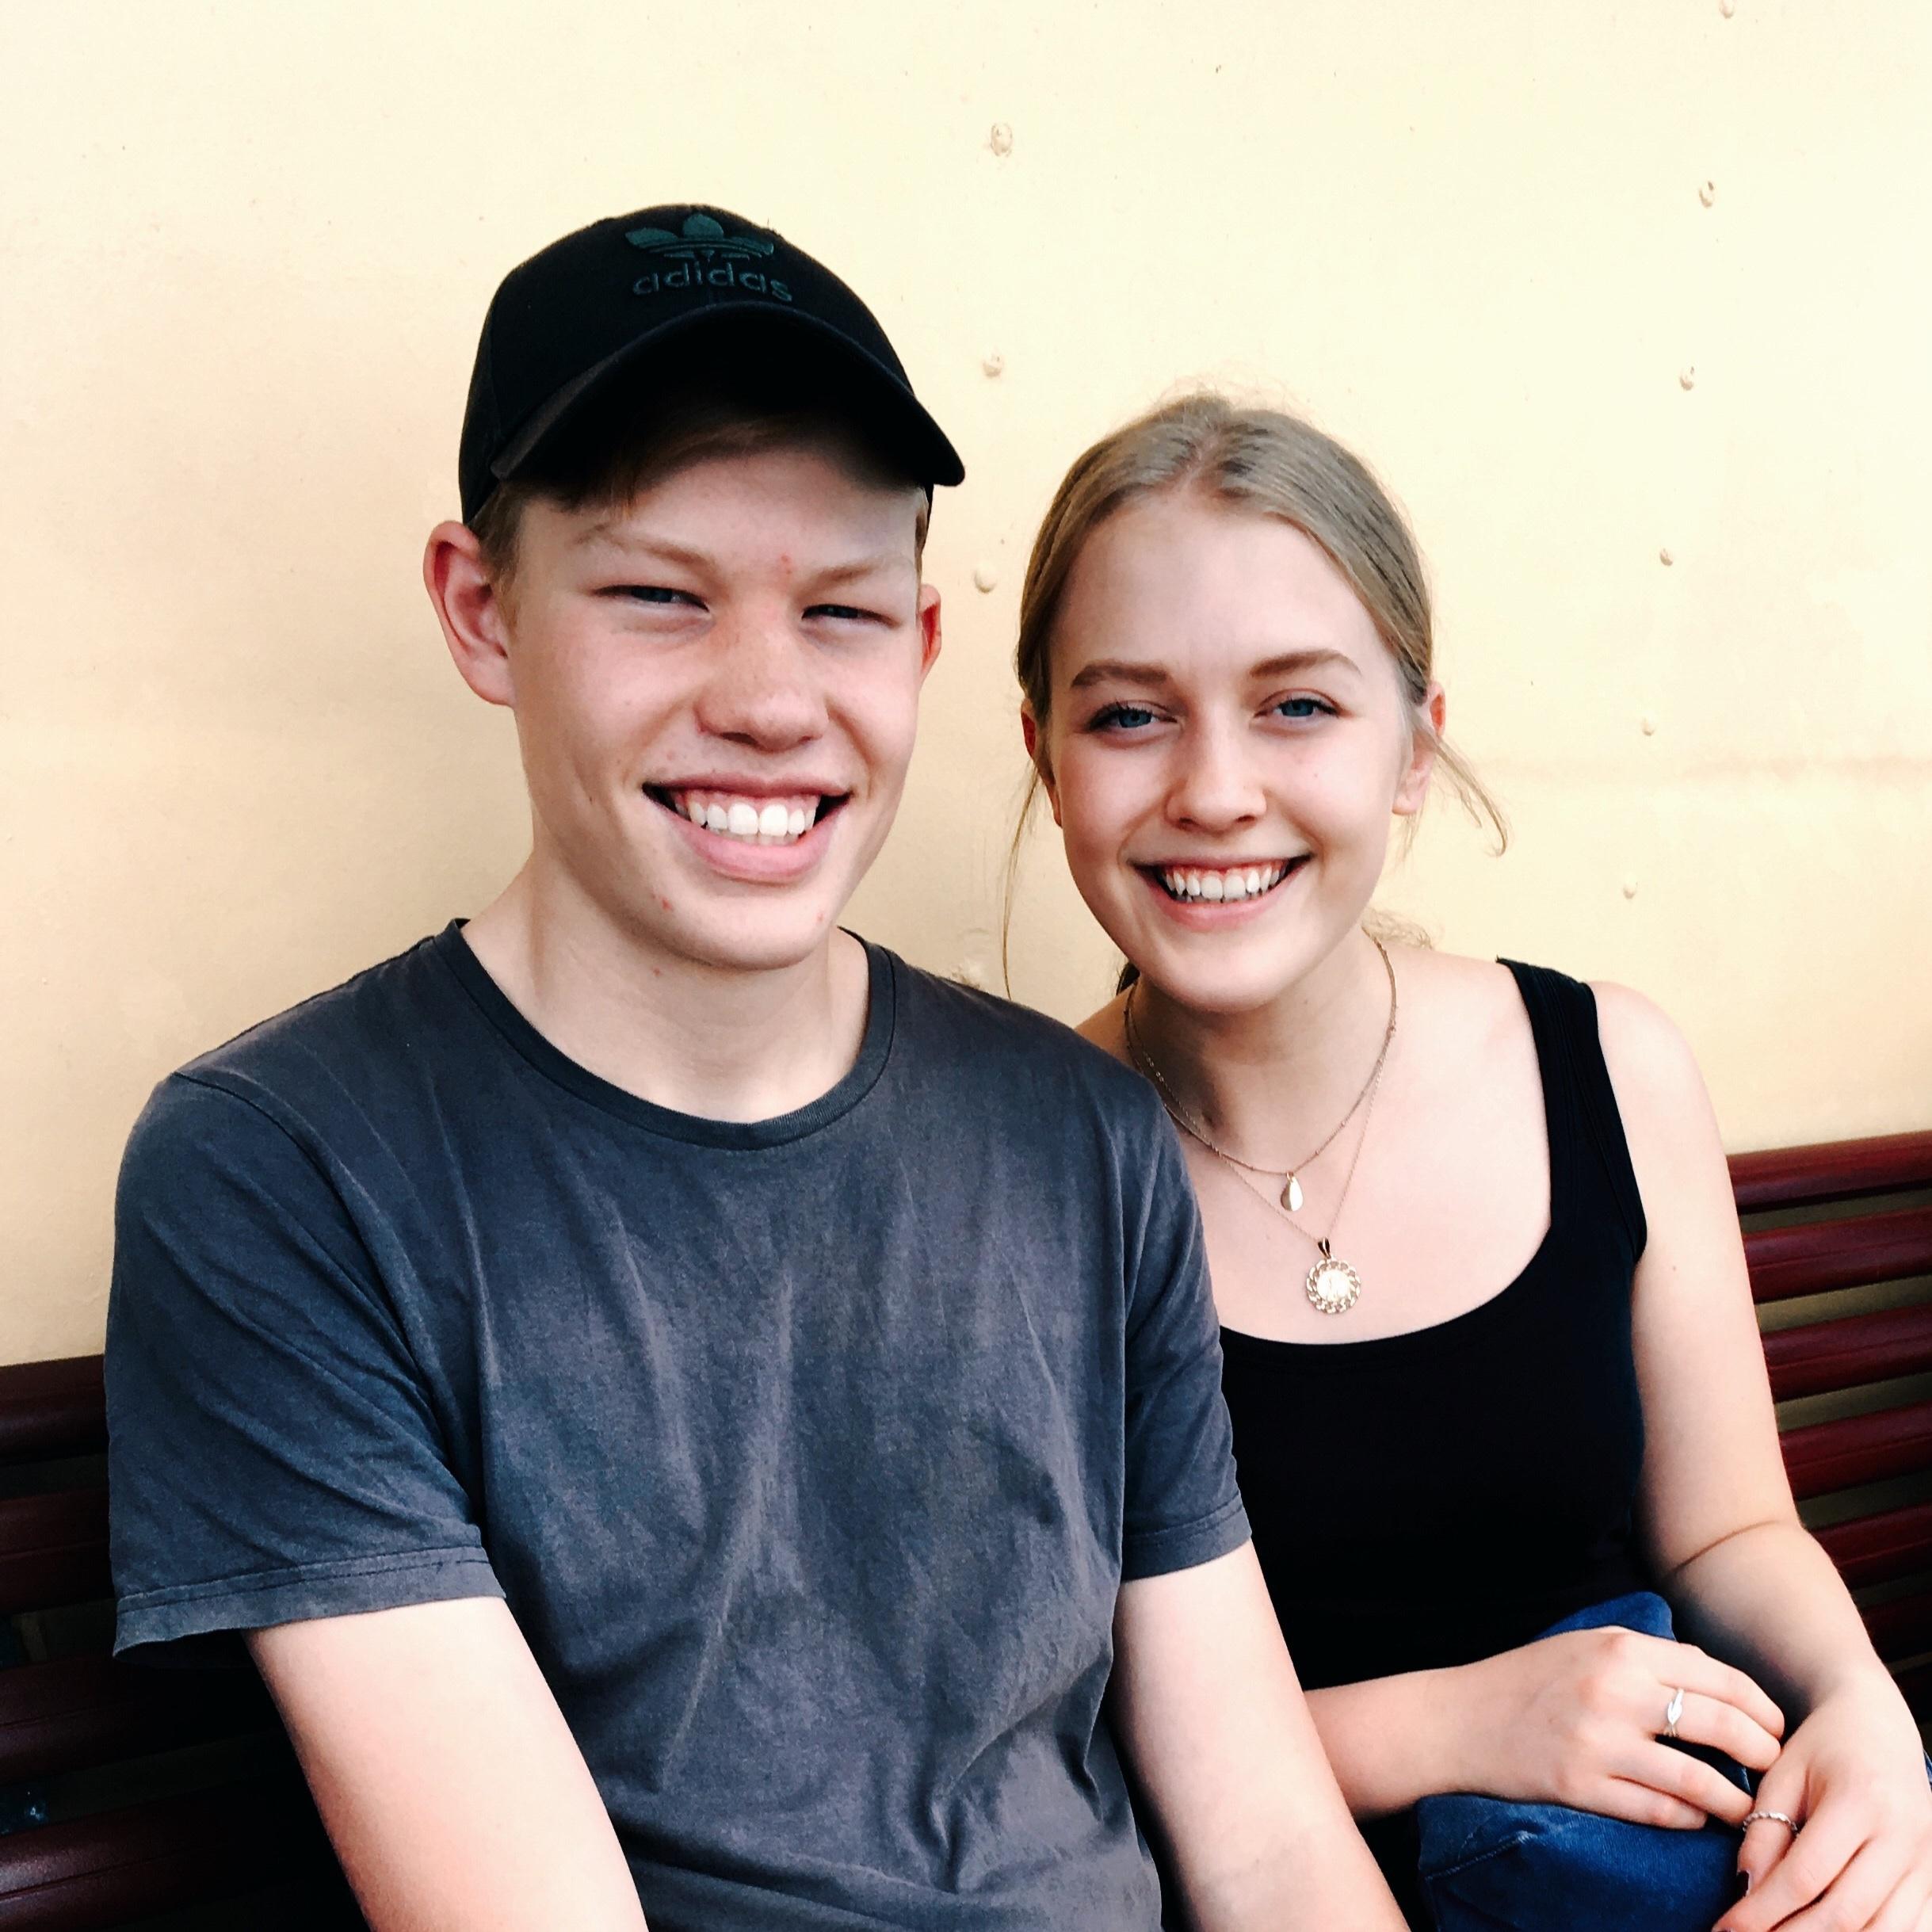 Anya and brother Alexander